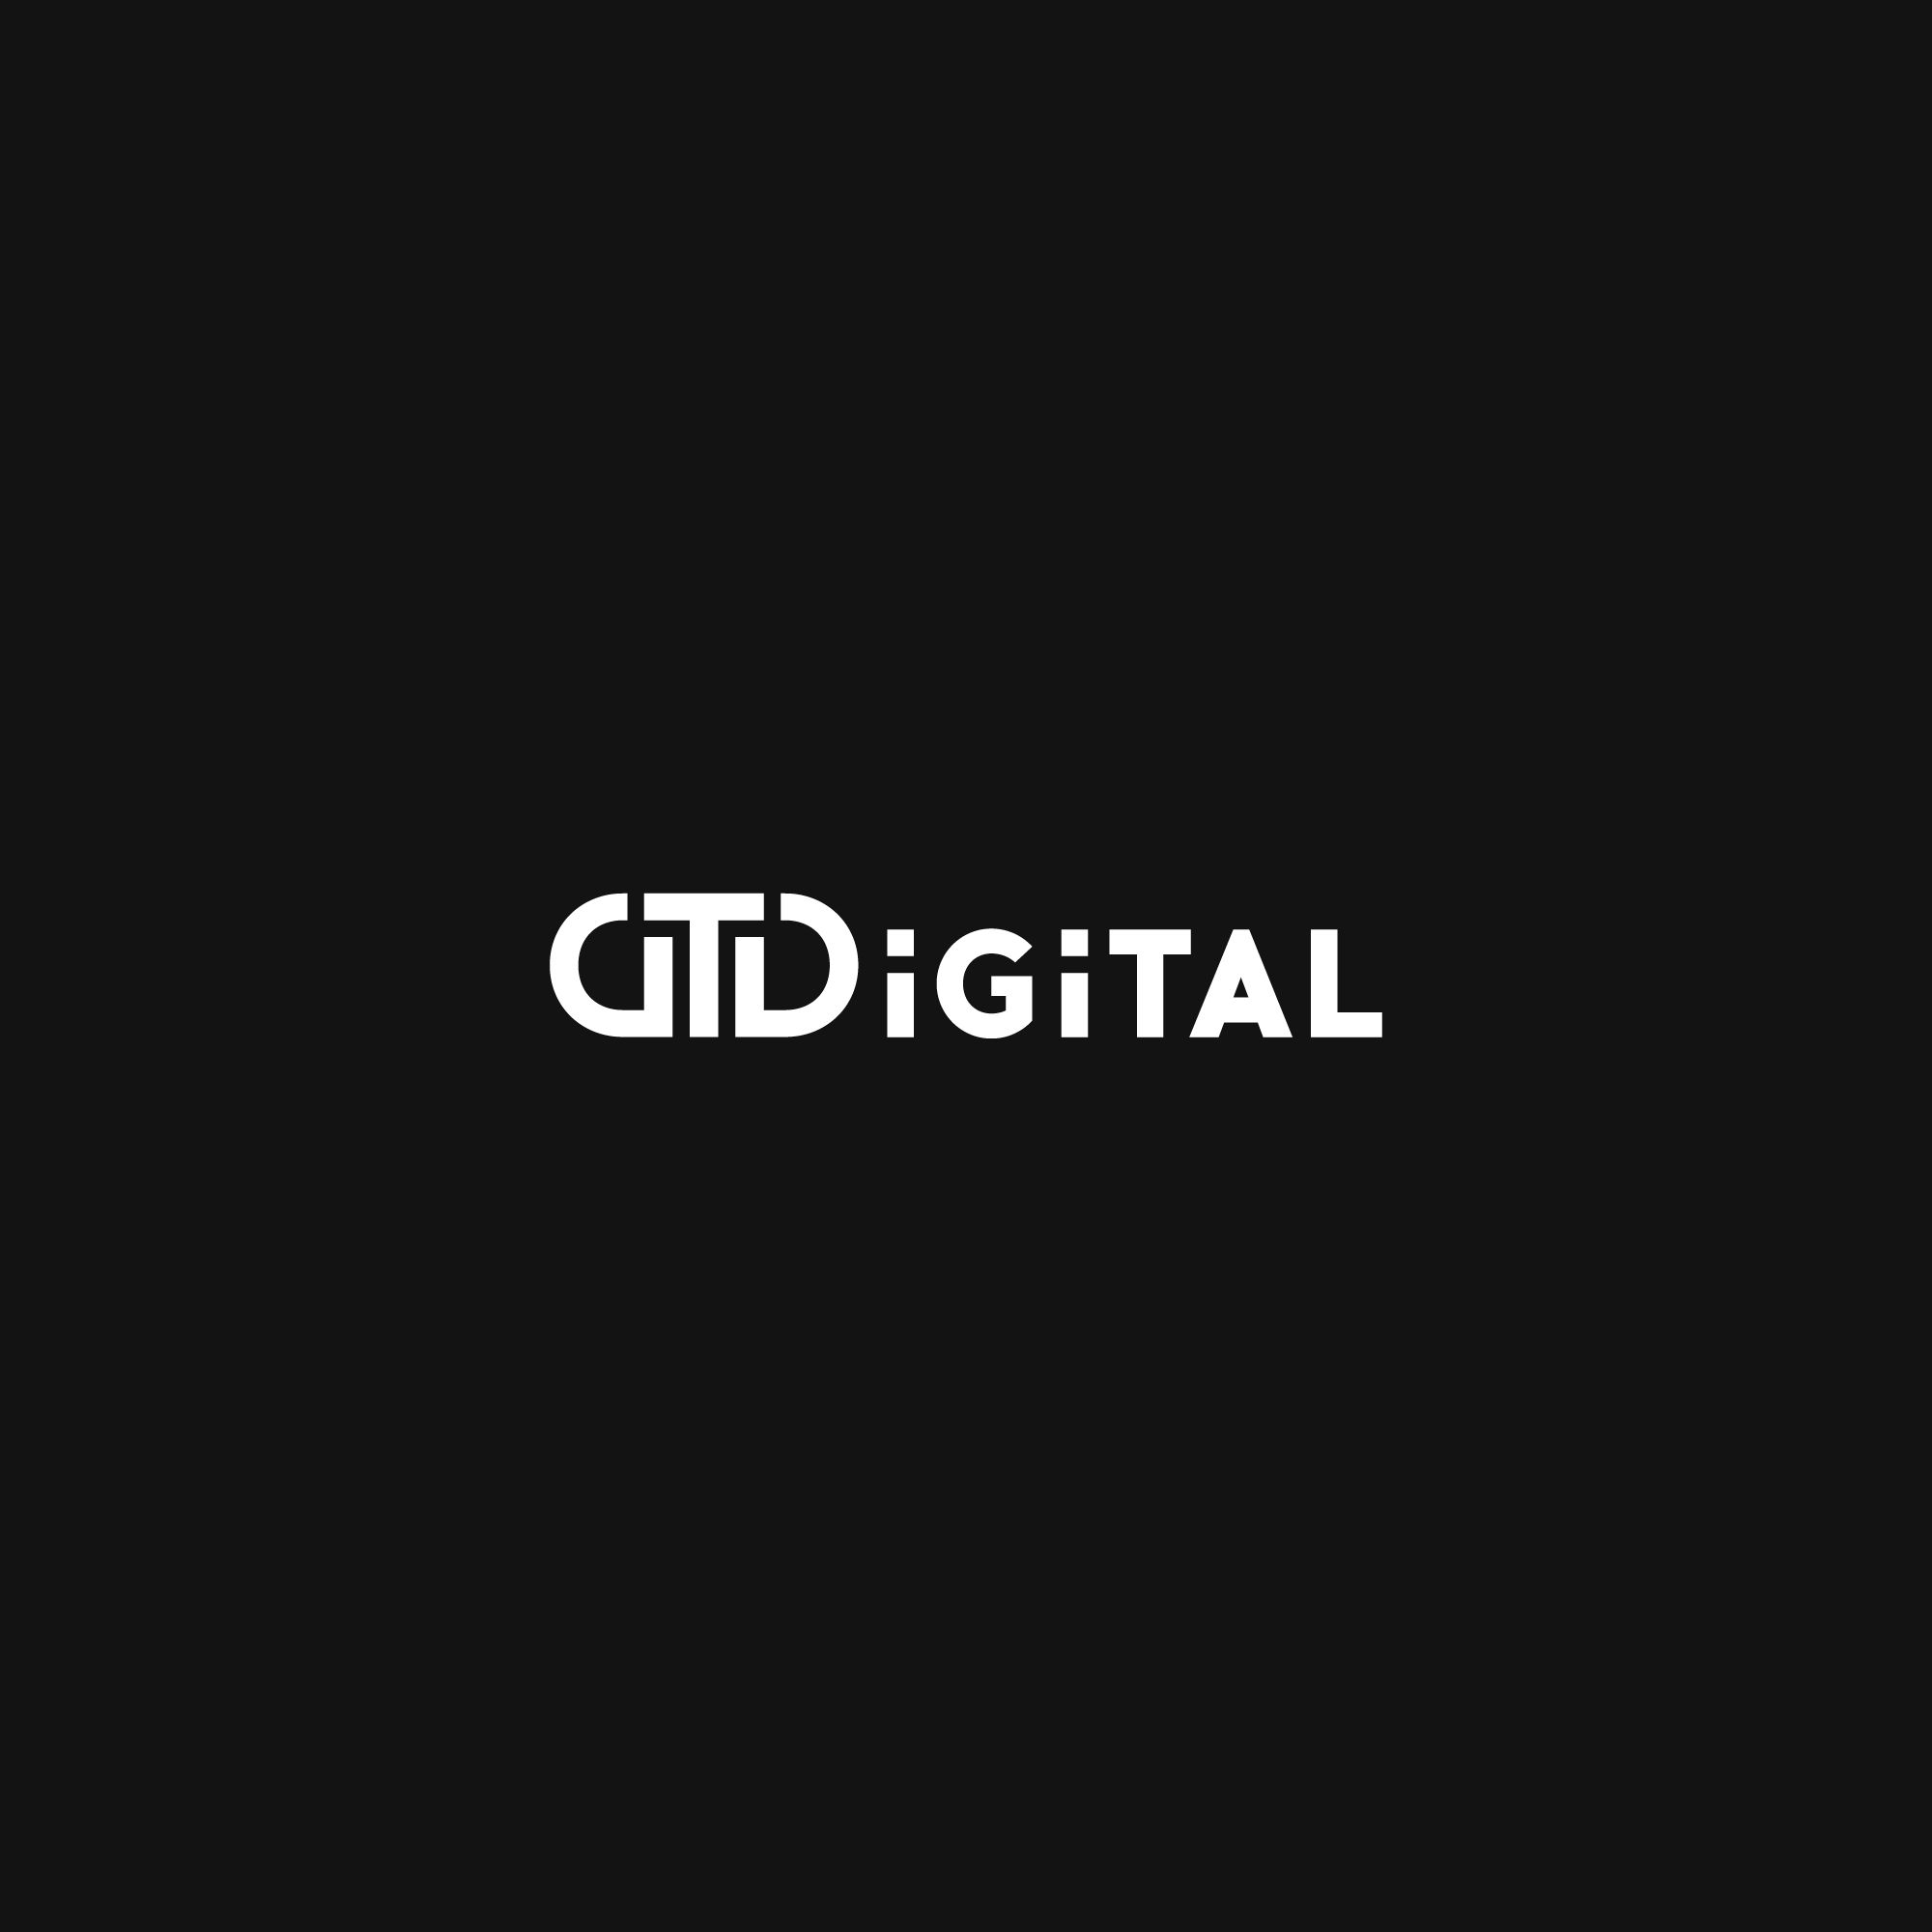 Логотип для ATDigital - дизайнер SANITARLESA